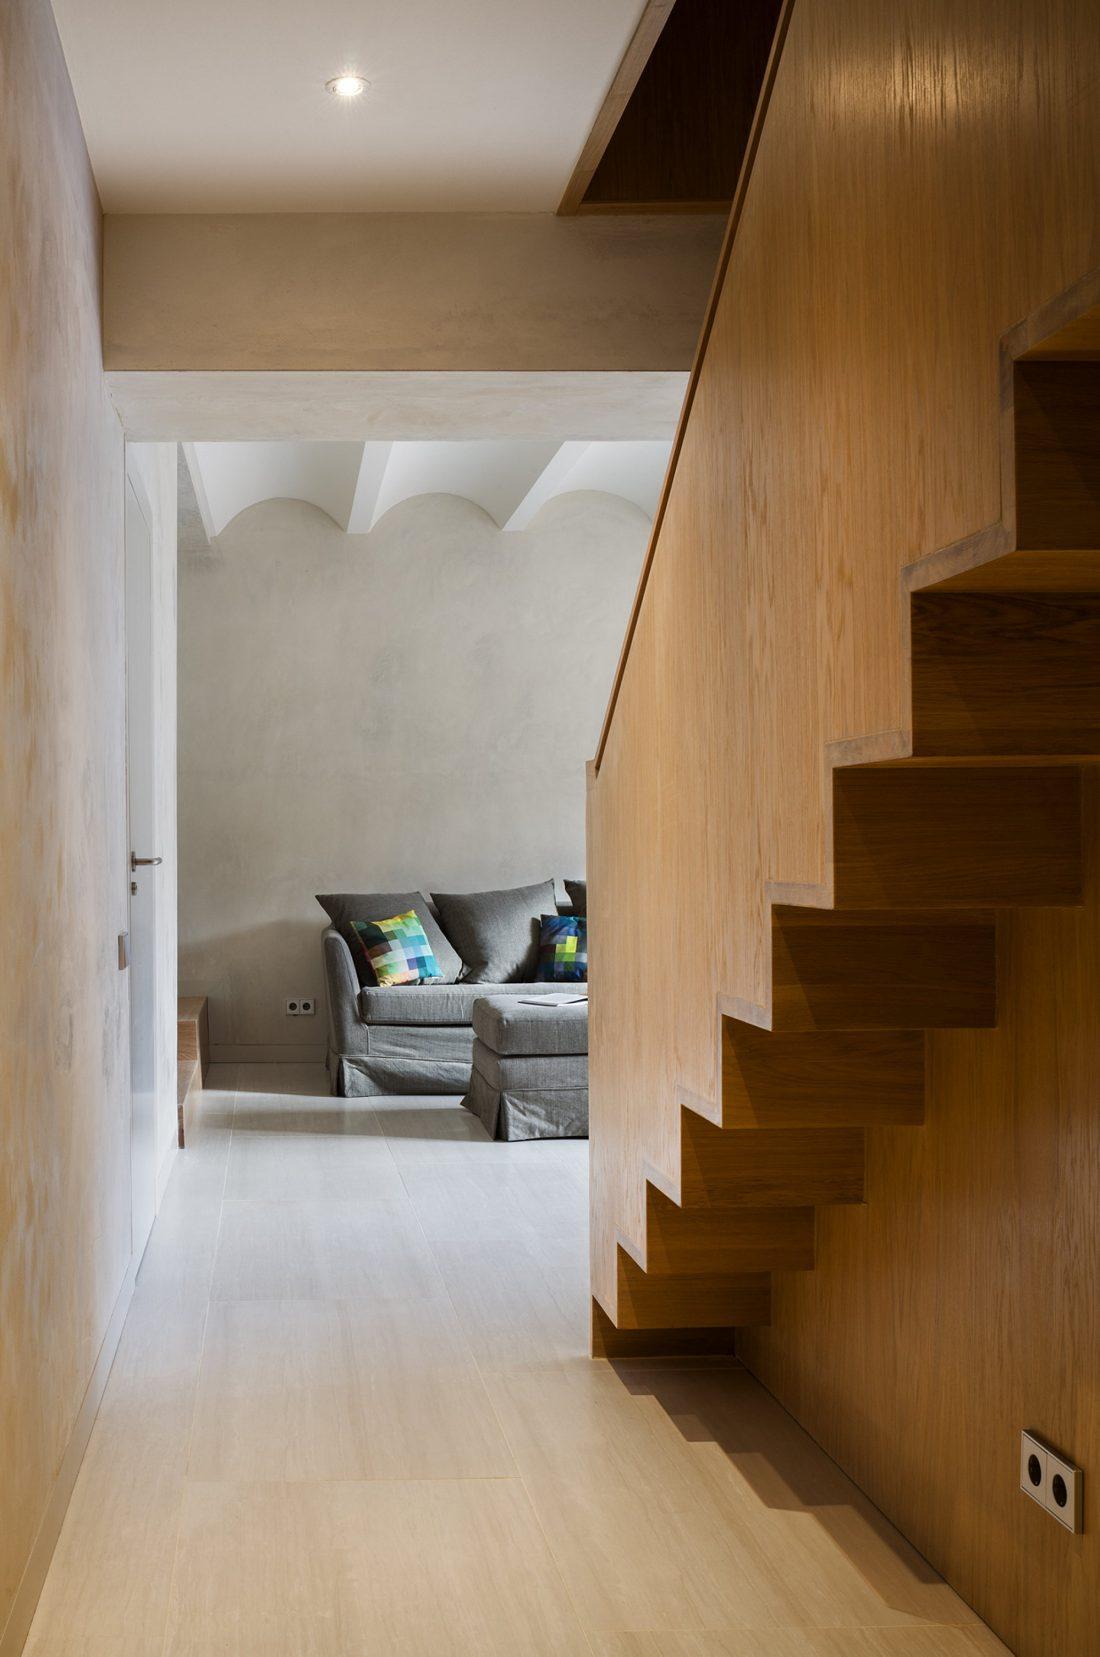 Дуплекс в Барселоне, по проекту студии Zest Architecture 9